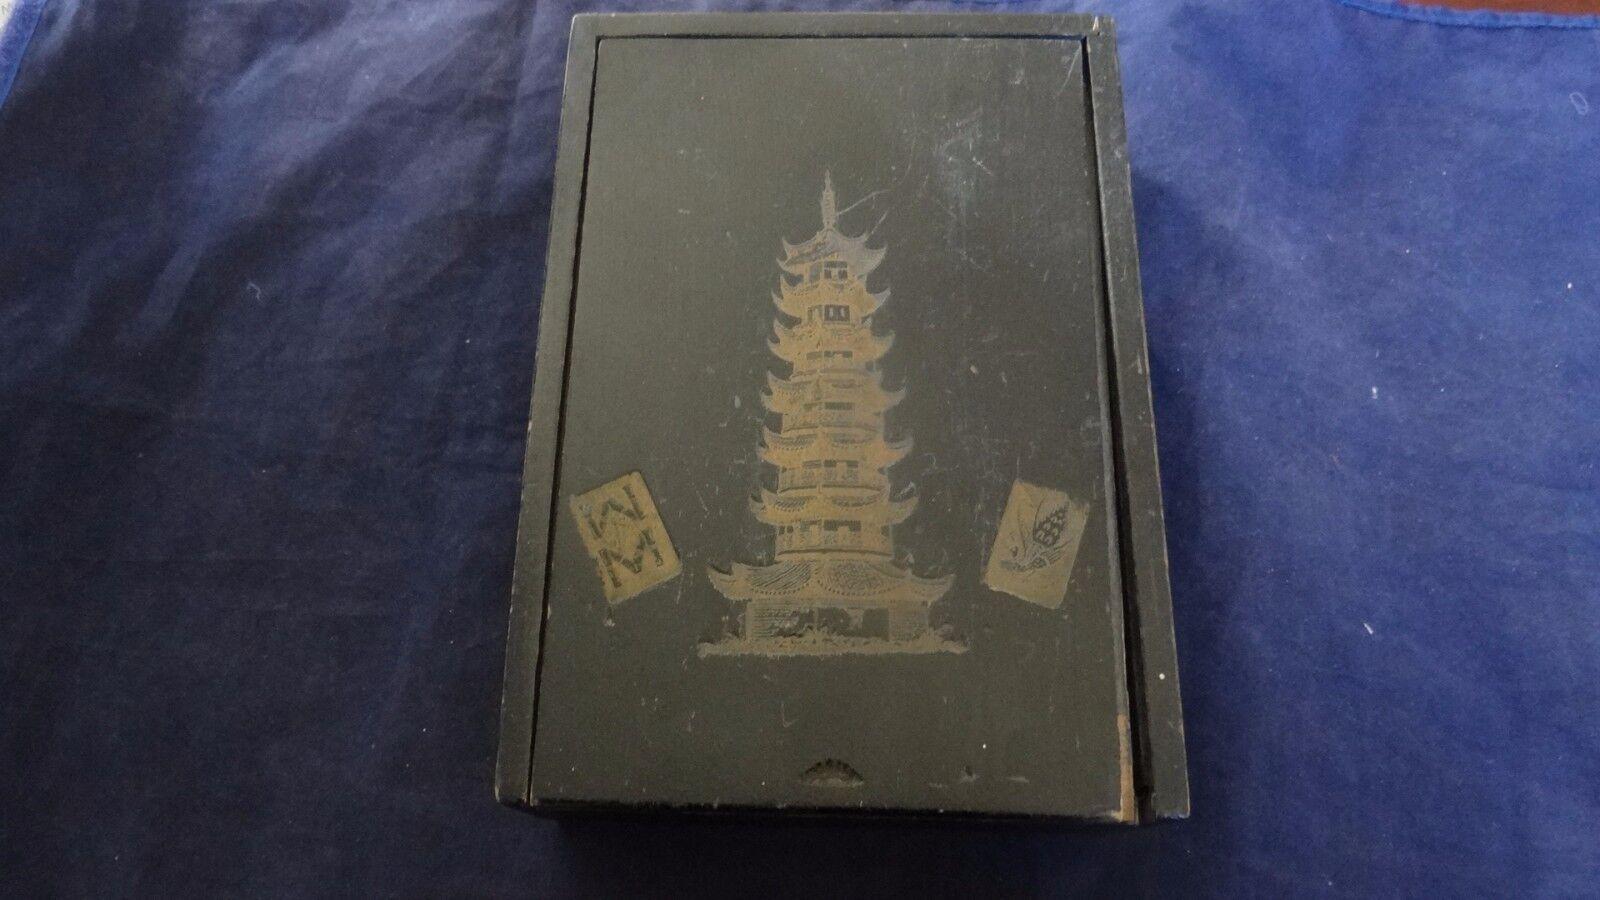 Vintage 1924 Mah Jong Bone Bamboo Set With Box And Instructions